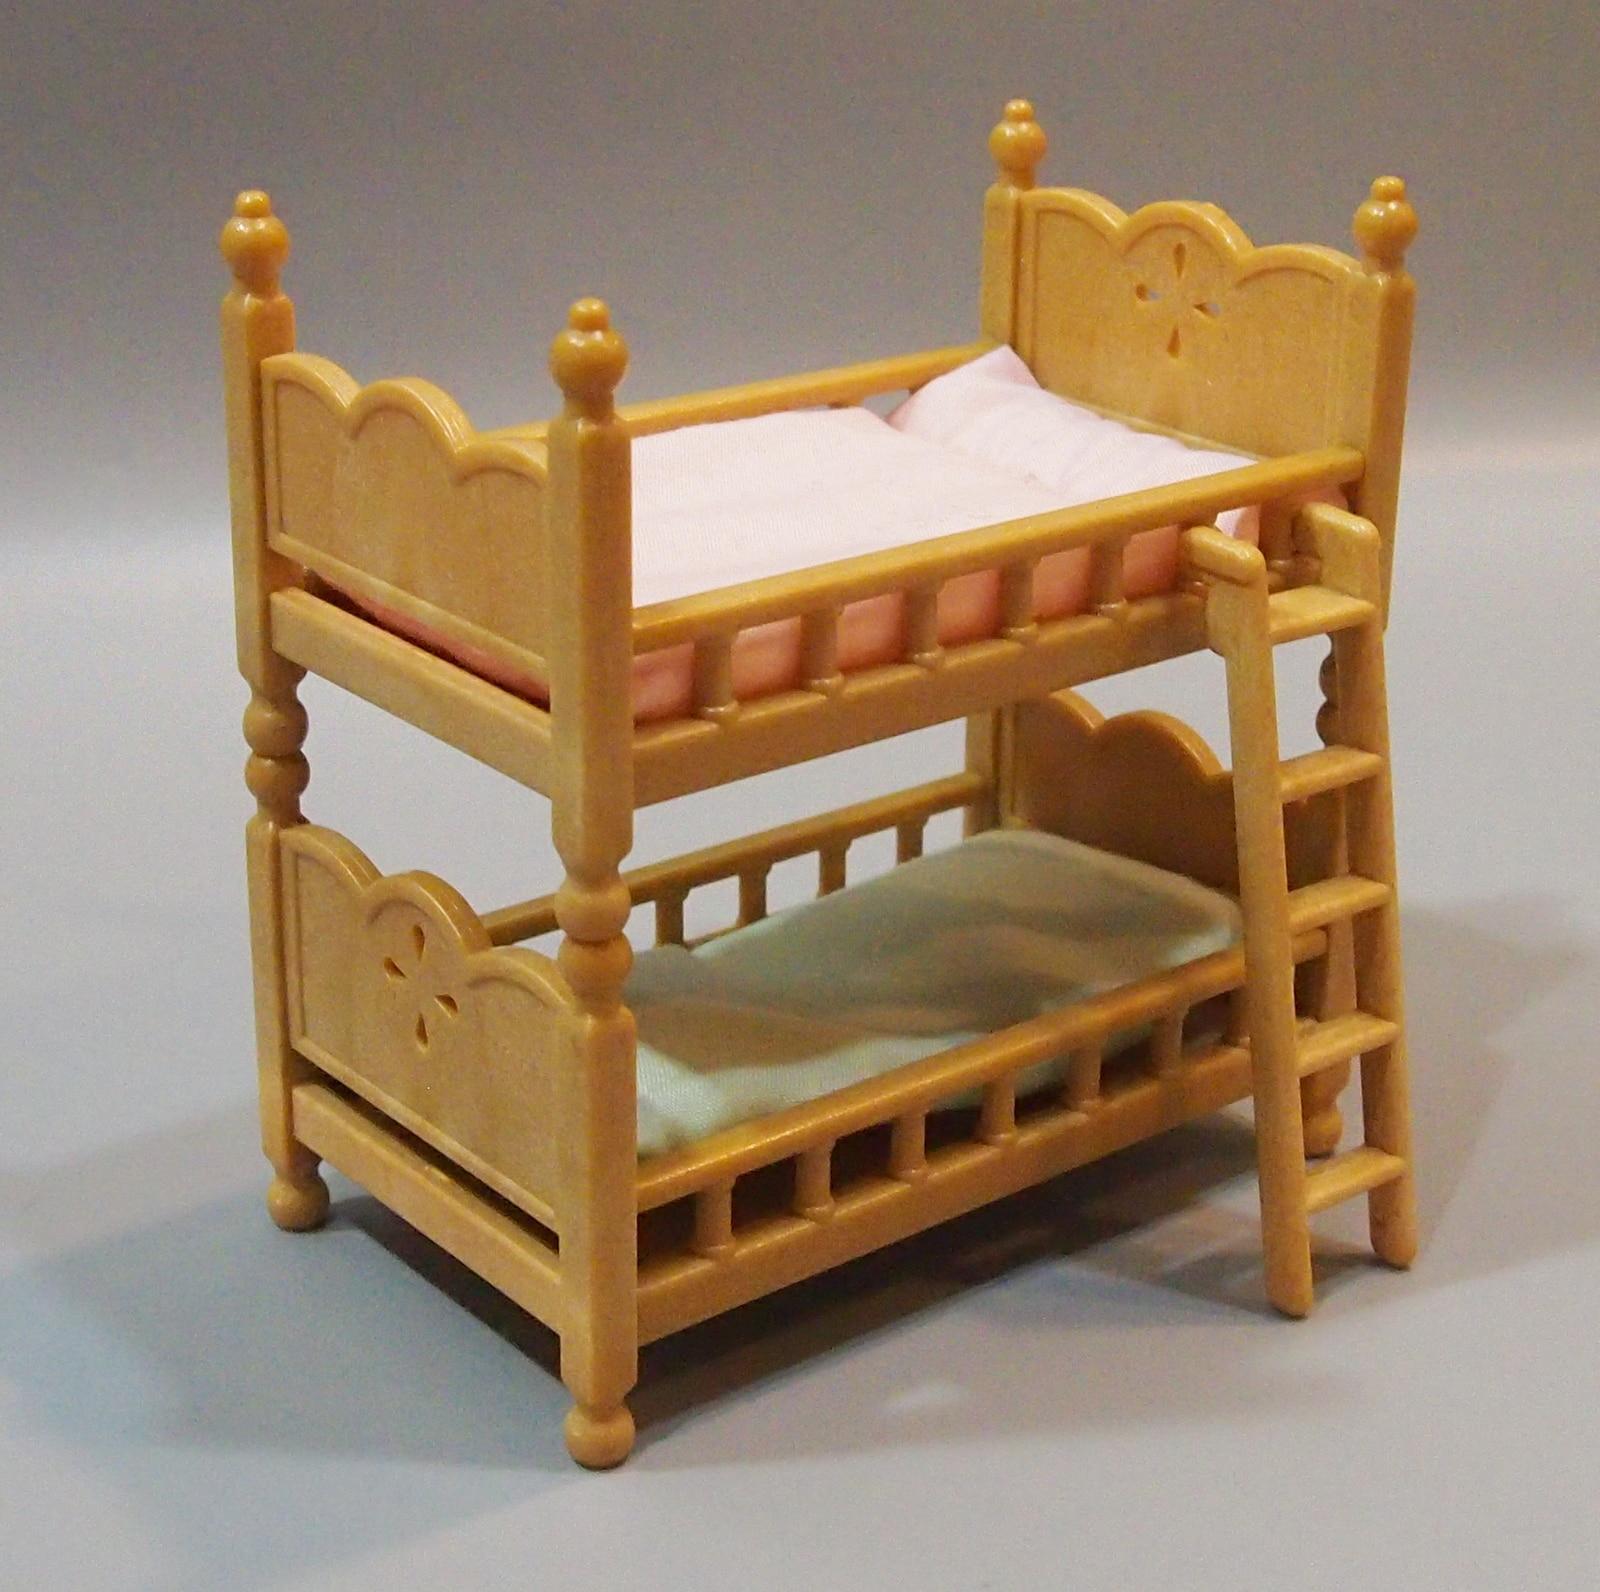 205 *Sylvanian Families furniture stroller set mosquito